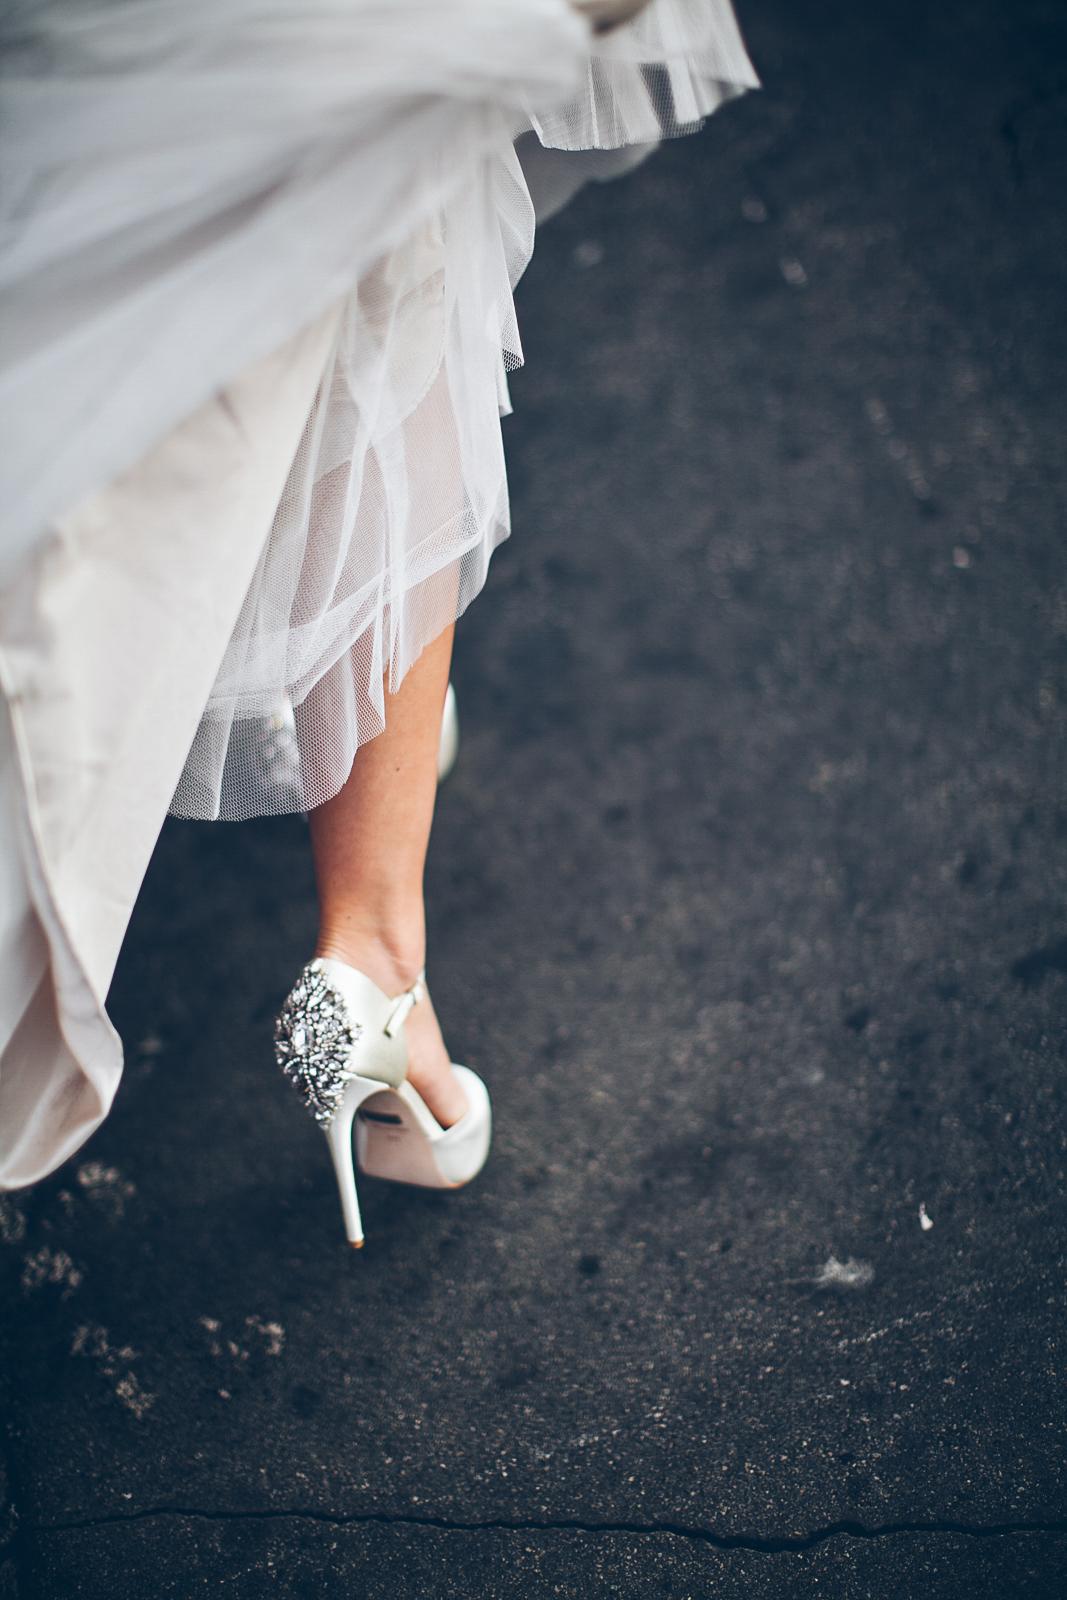 San_francisco_city_hall_wedding_photography_meegan_travis_ebony_siovhan_bokeh_photography_88.jpg